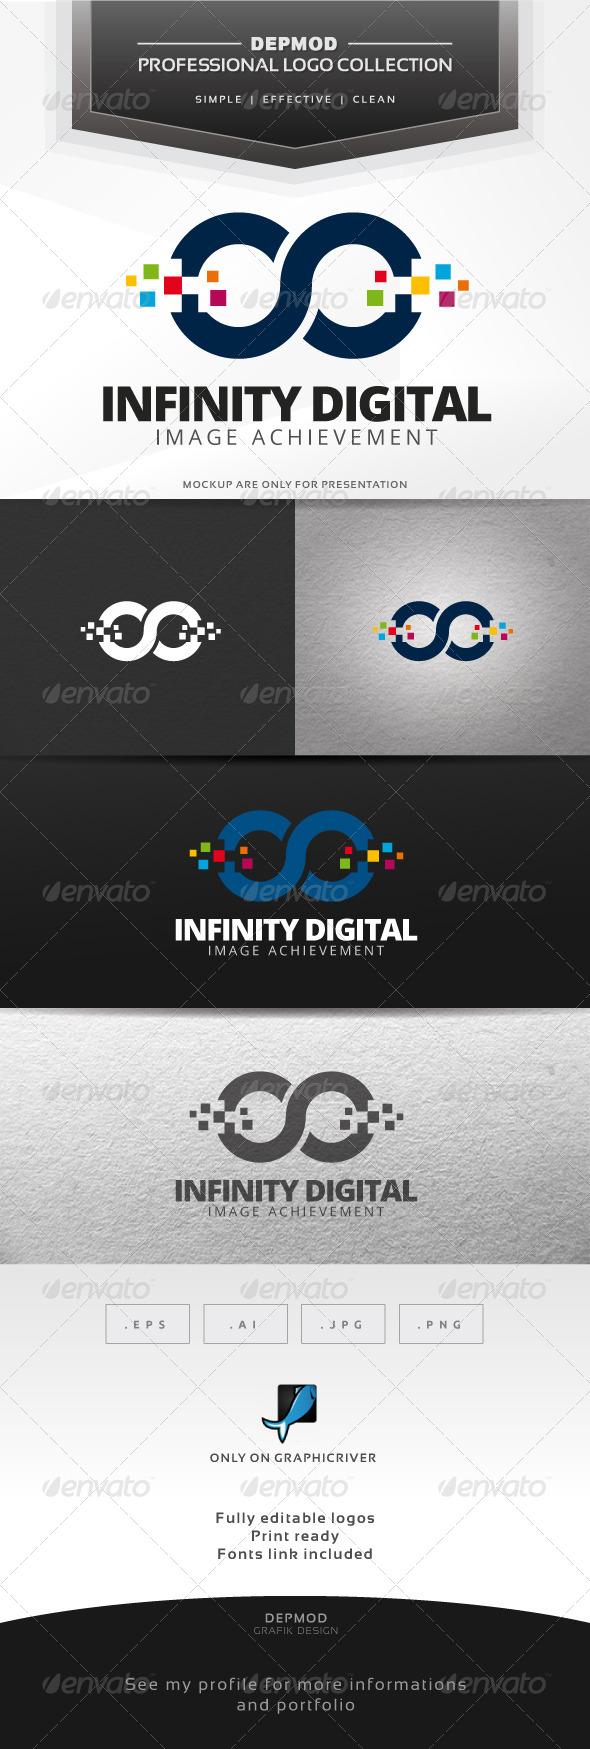 GraphicRiver Infinity Digital Logo 7684534